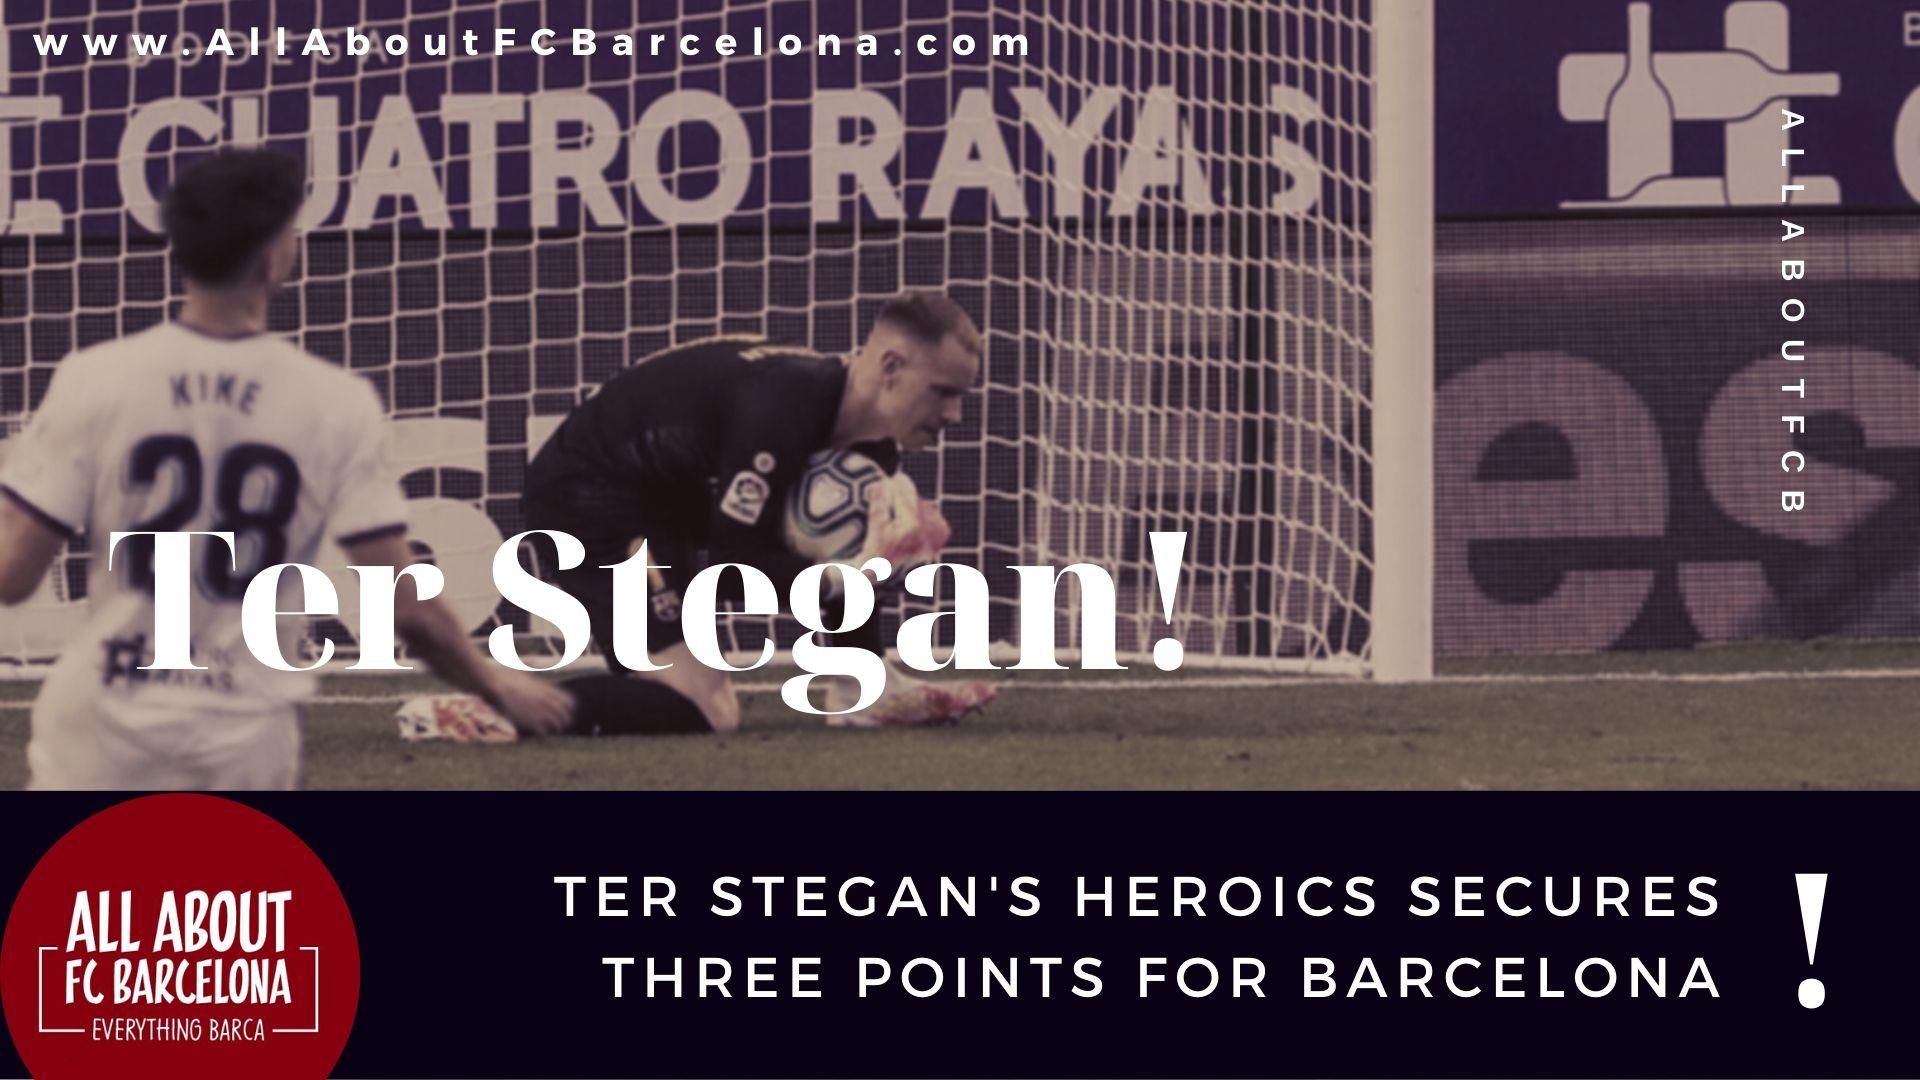 Ter Stegan was instrumental for Barcelona against Real Valladolid